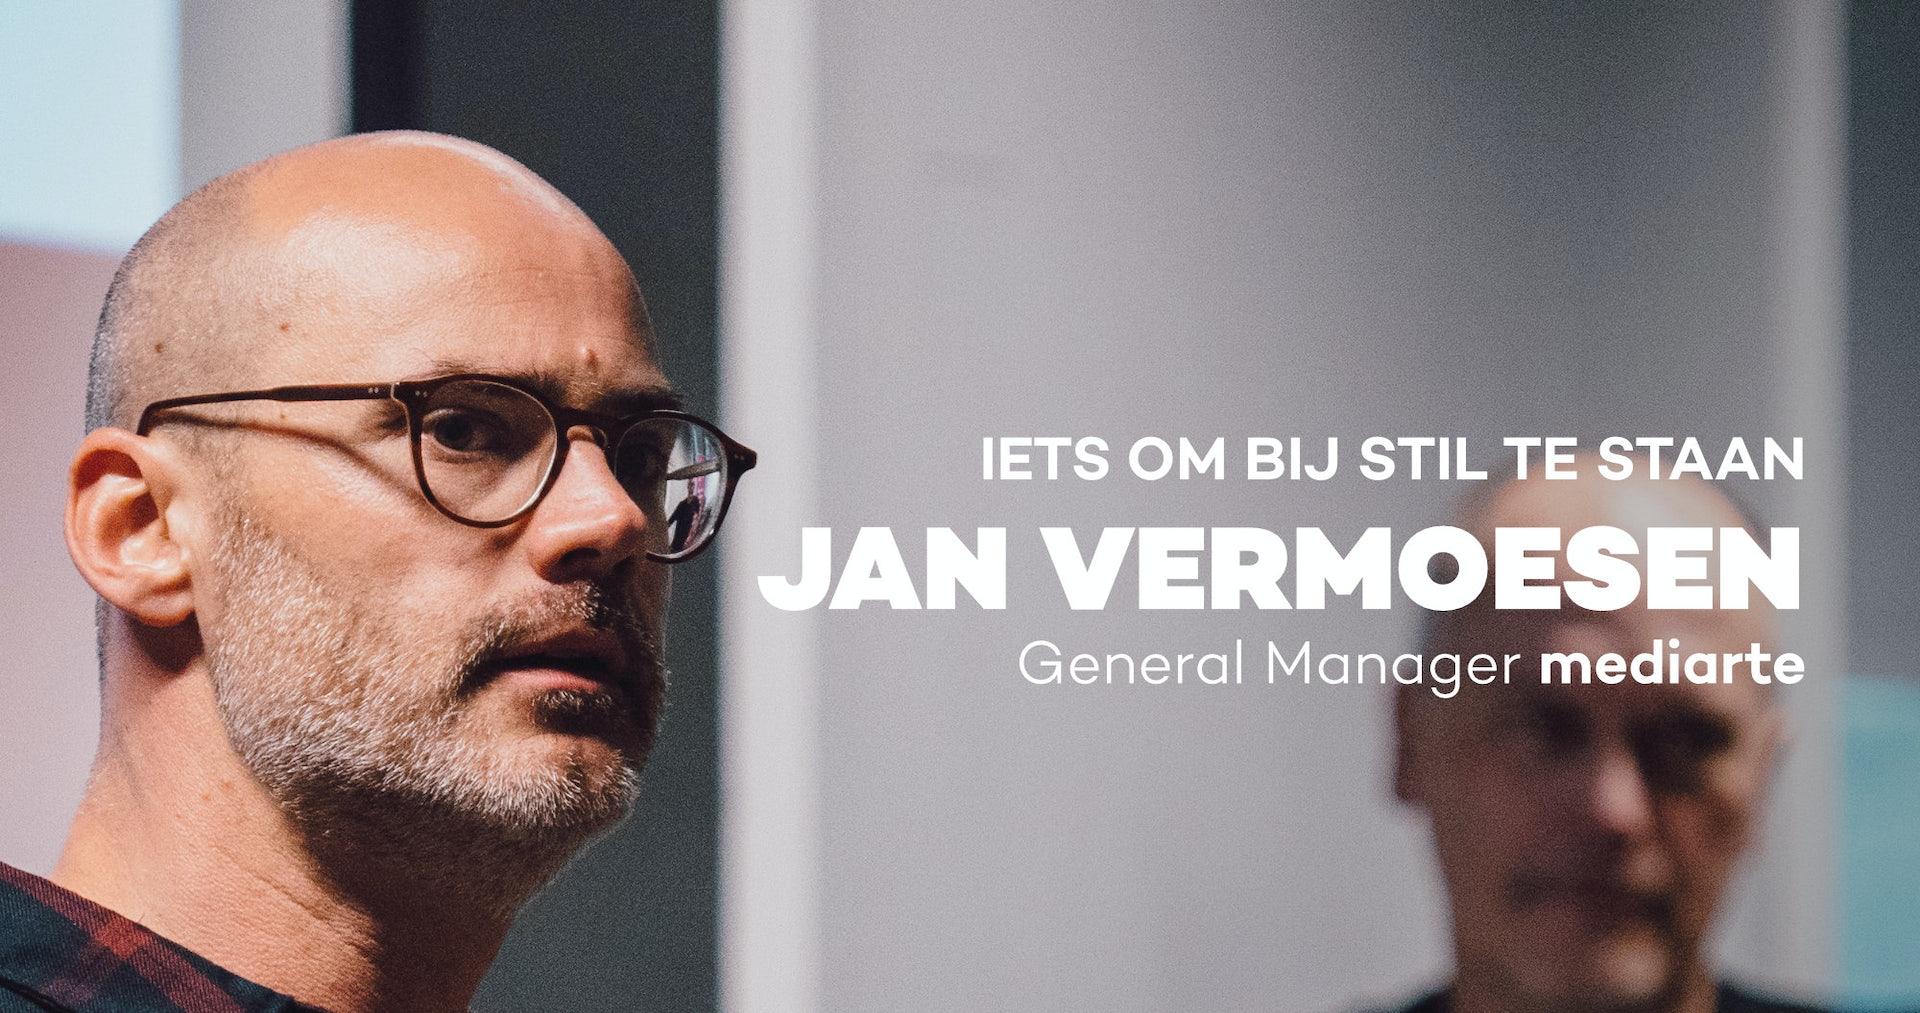 Jan Vermoesen